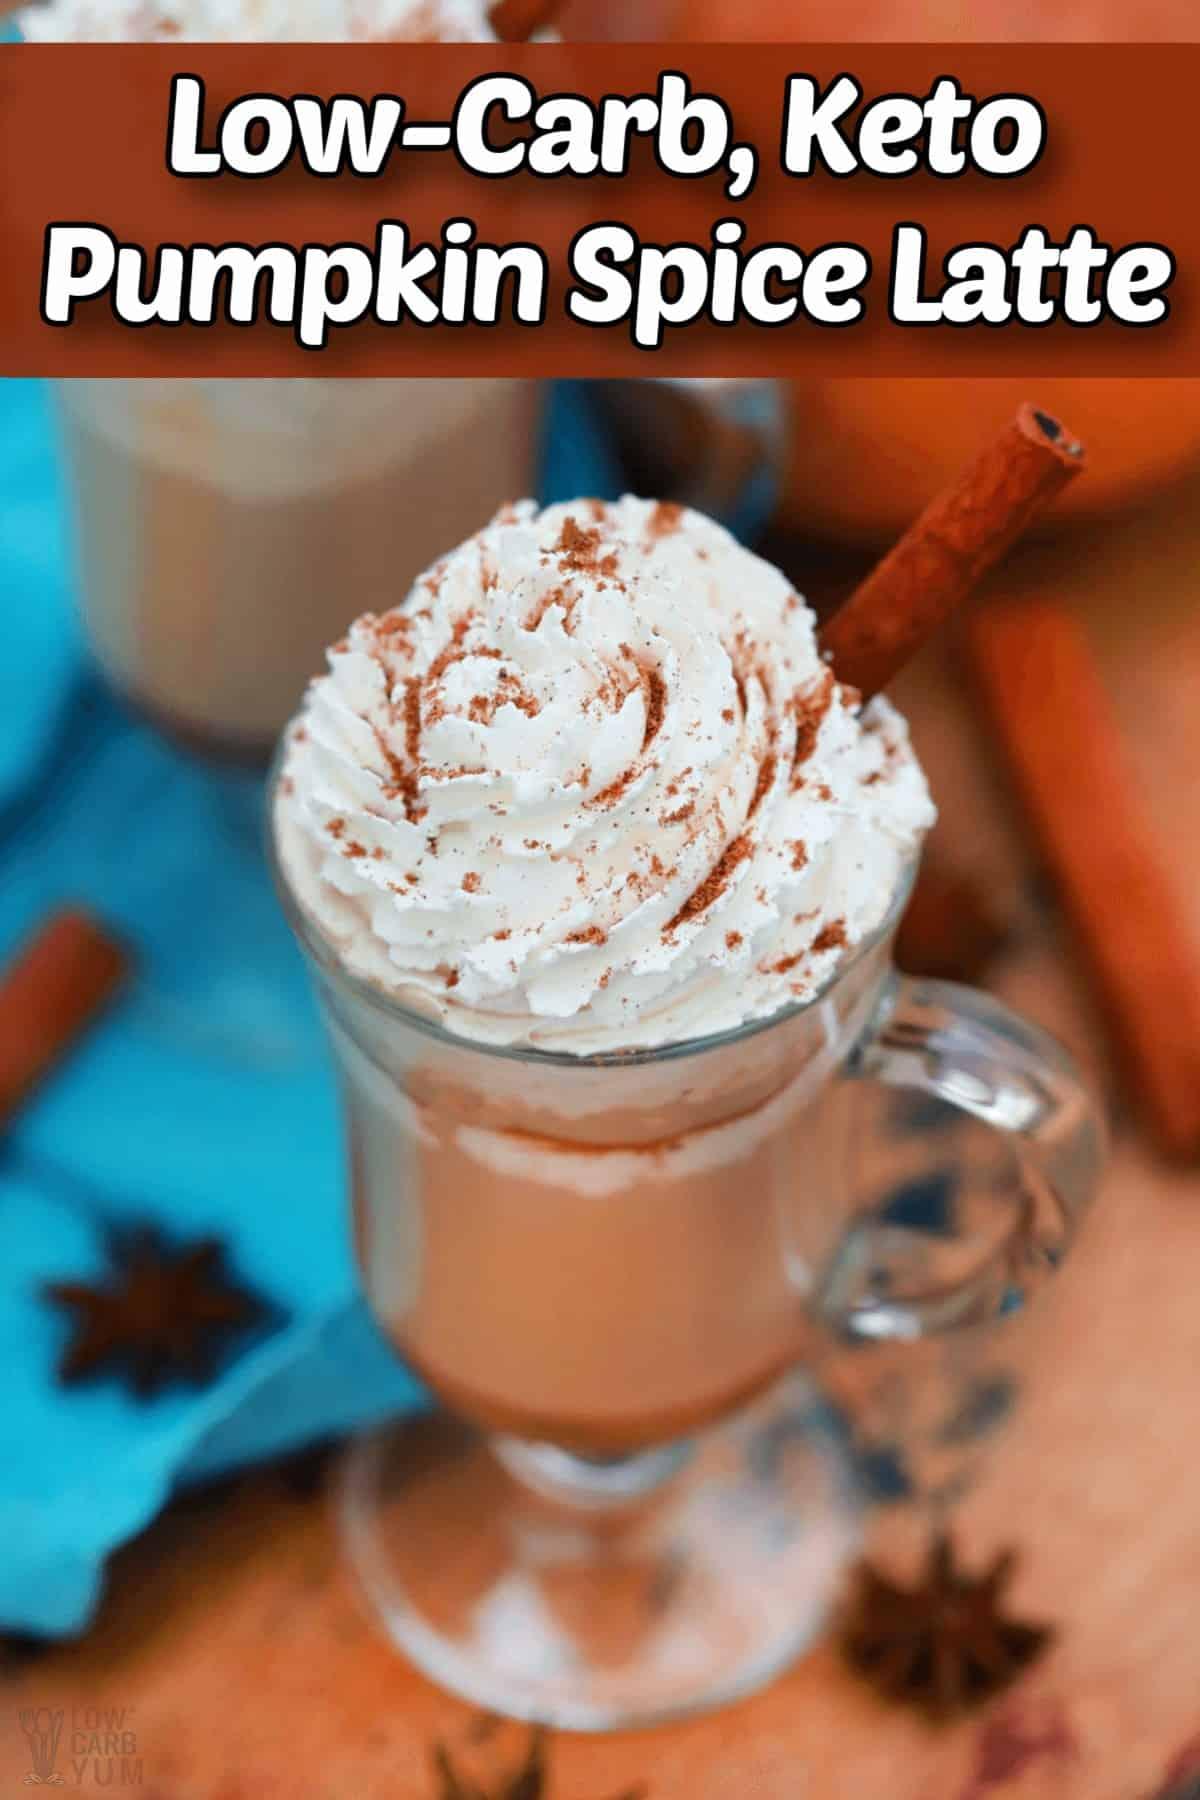 keto pumpkin spice latte coffee recipe pintrest image